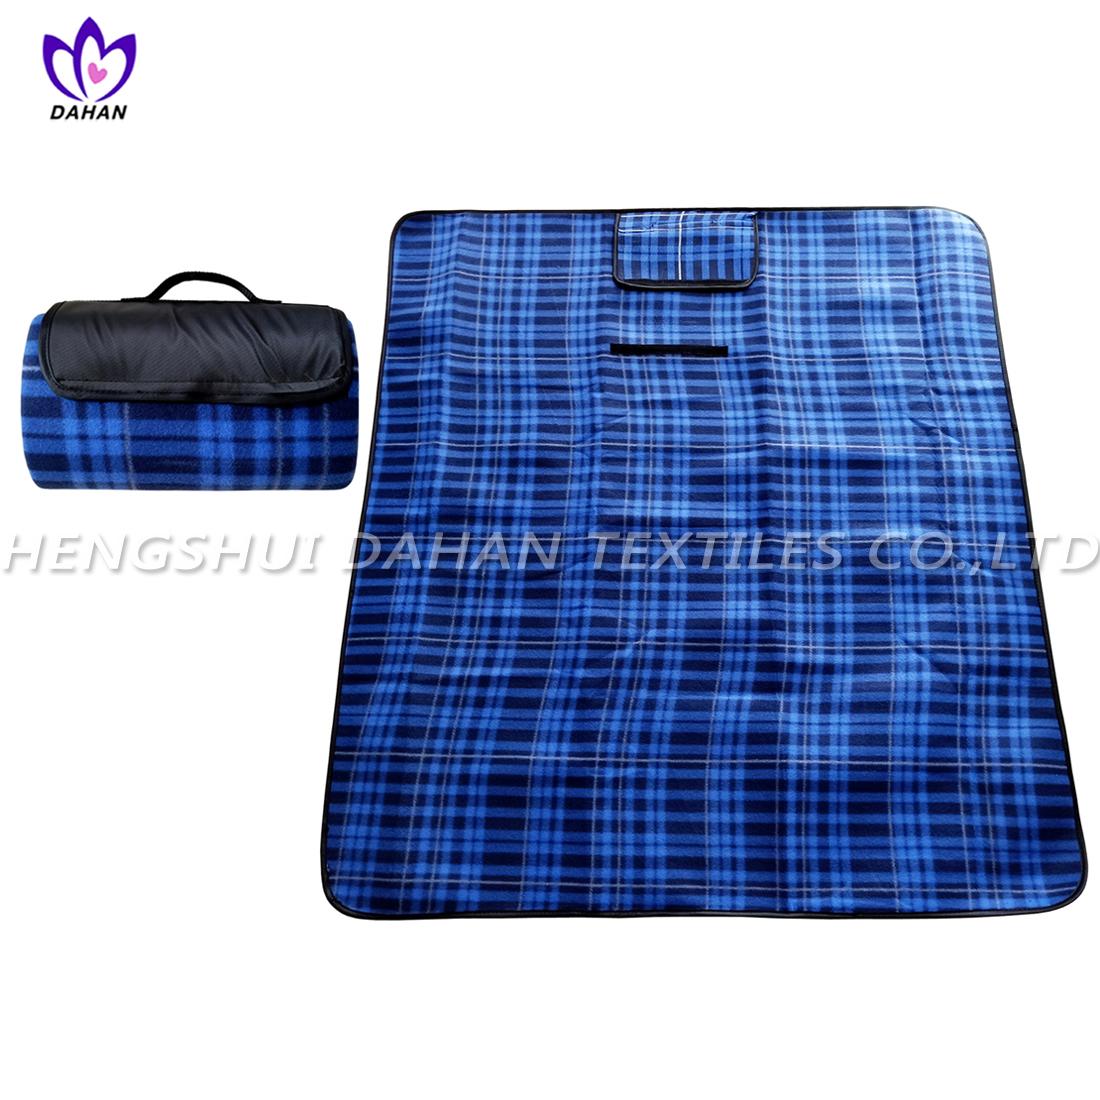 Picnic blanket waterproof picnic mat with printing.PM17